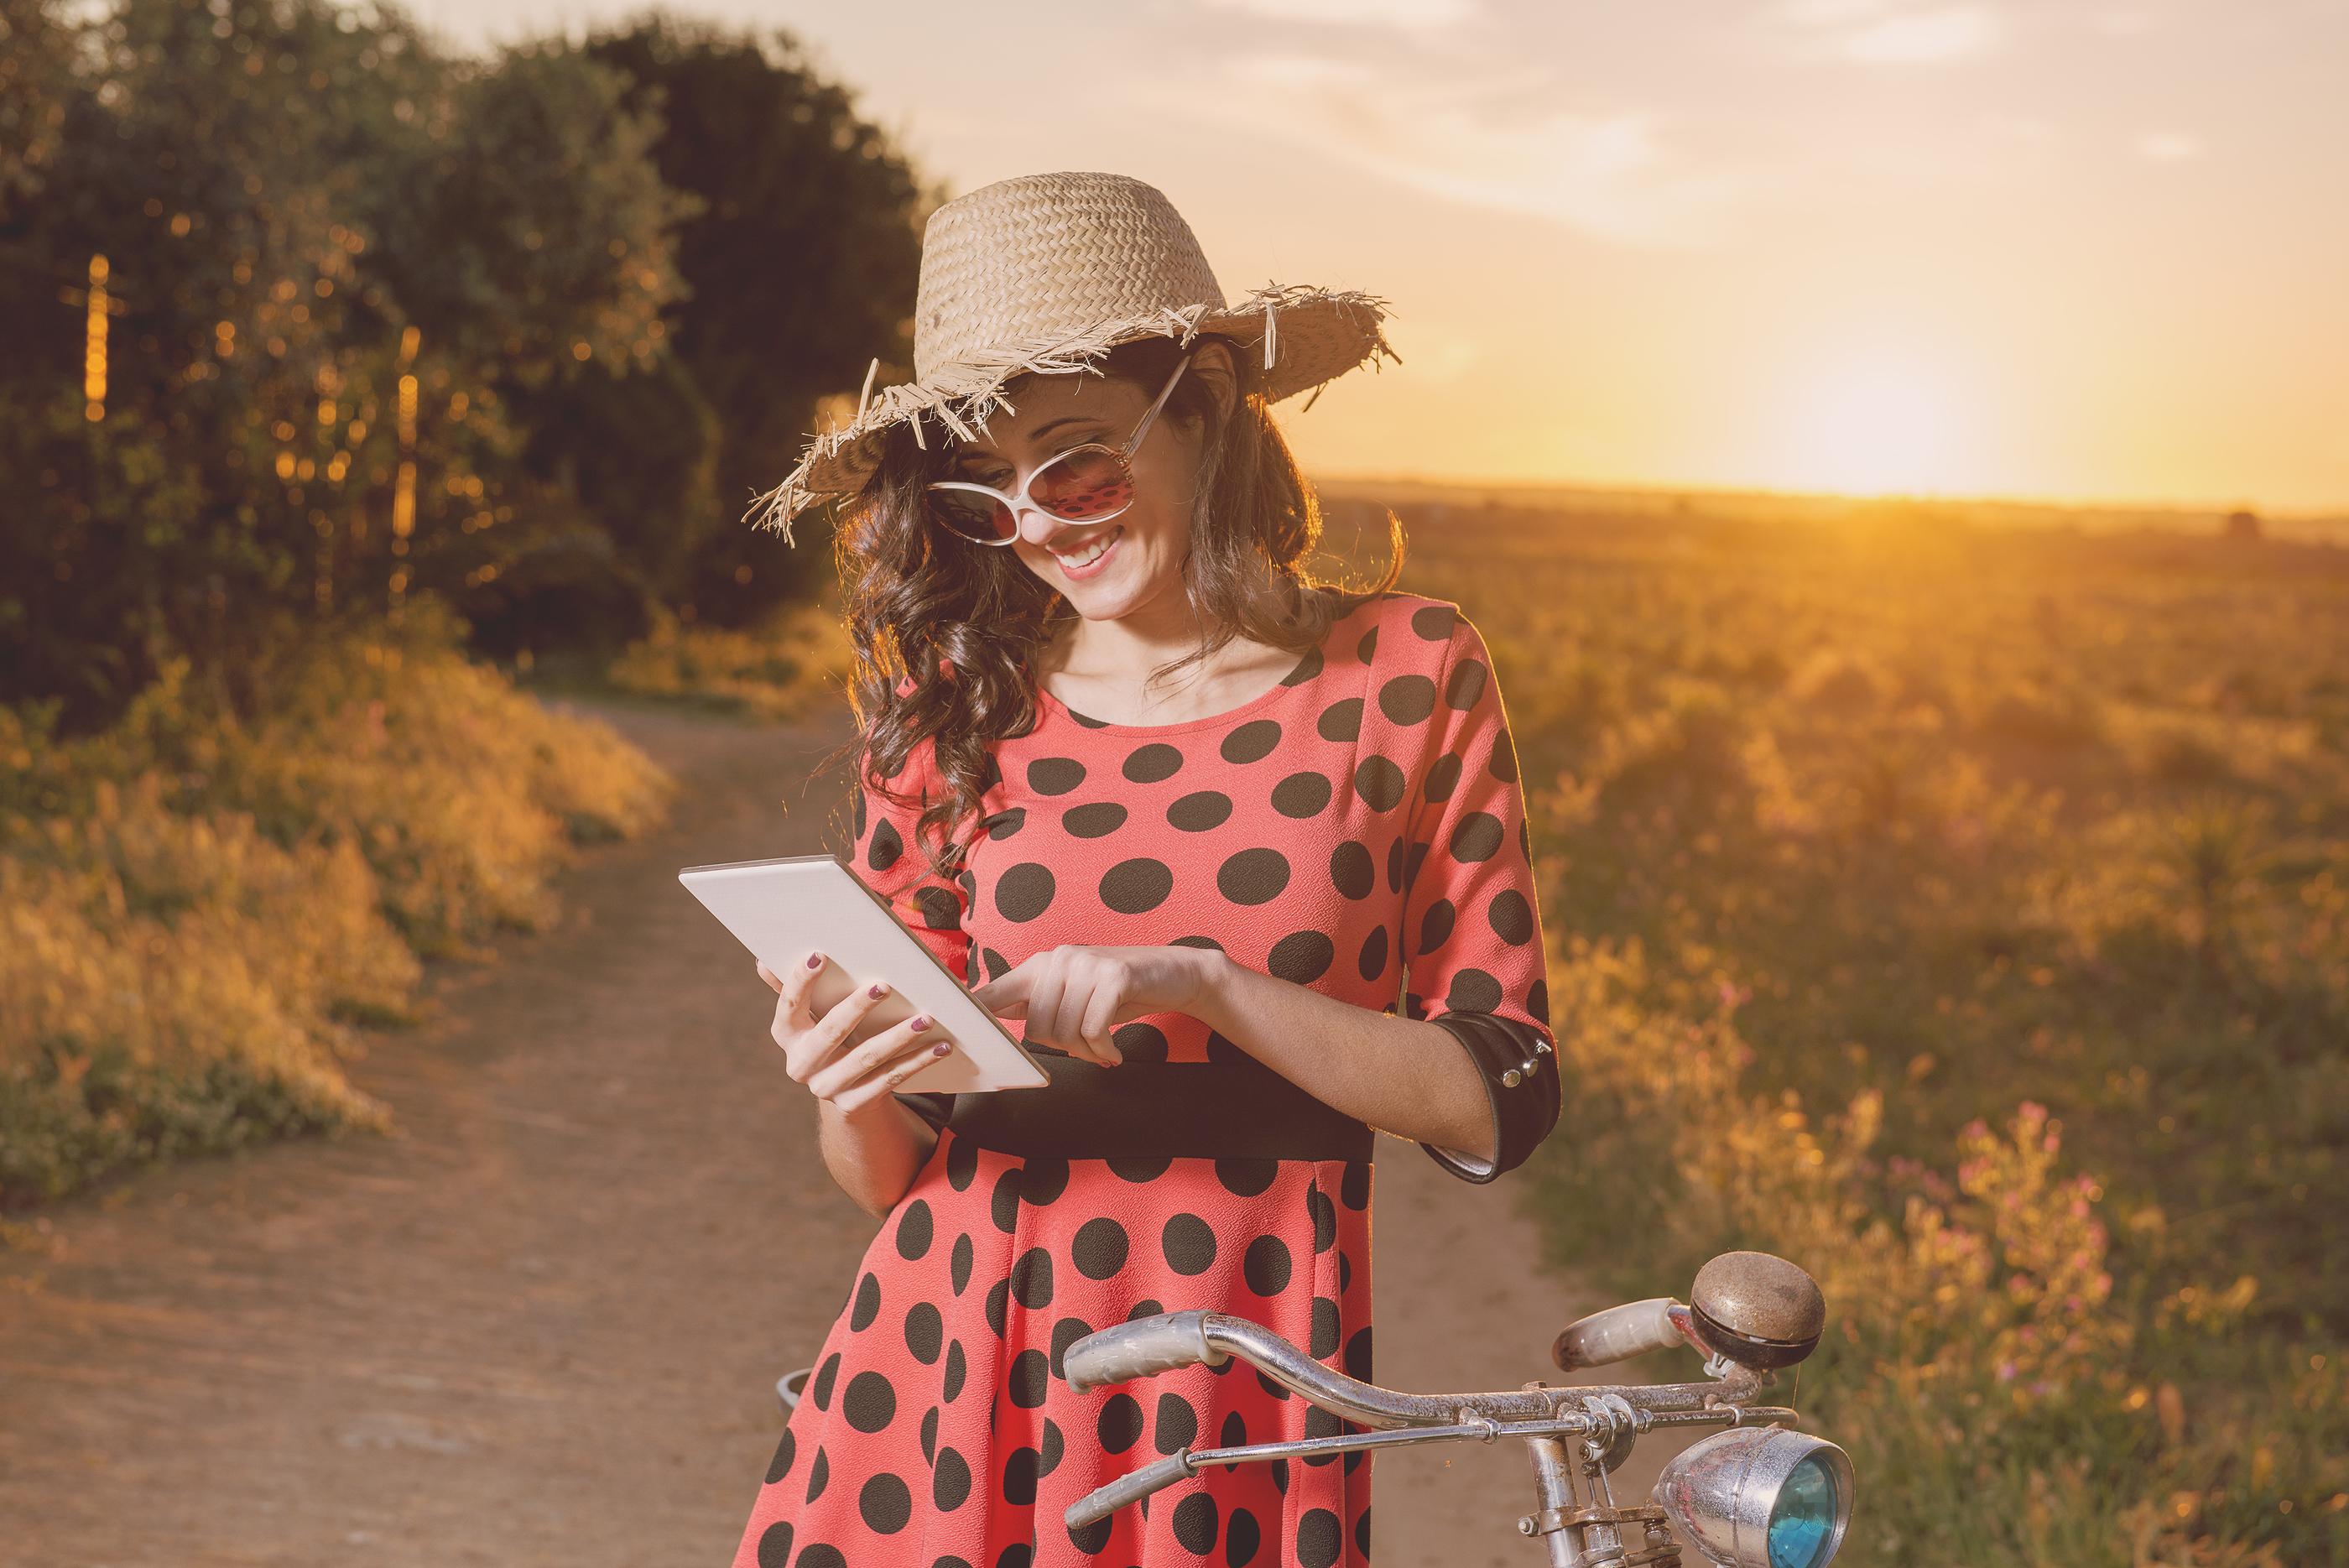 Summer Reading | Blogs For Your Break | July's Sum Sum Summatime Playlist